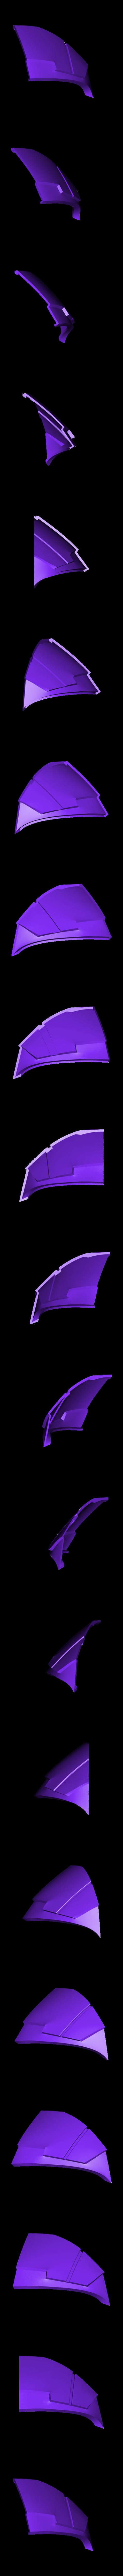 Part_2.stl Download free STL file Mass Effect N7 Breather Helmet • Template to 3D print, VillainousPropShop